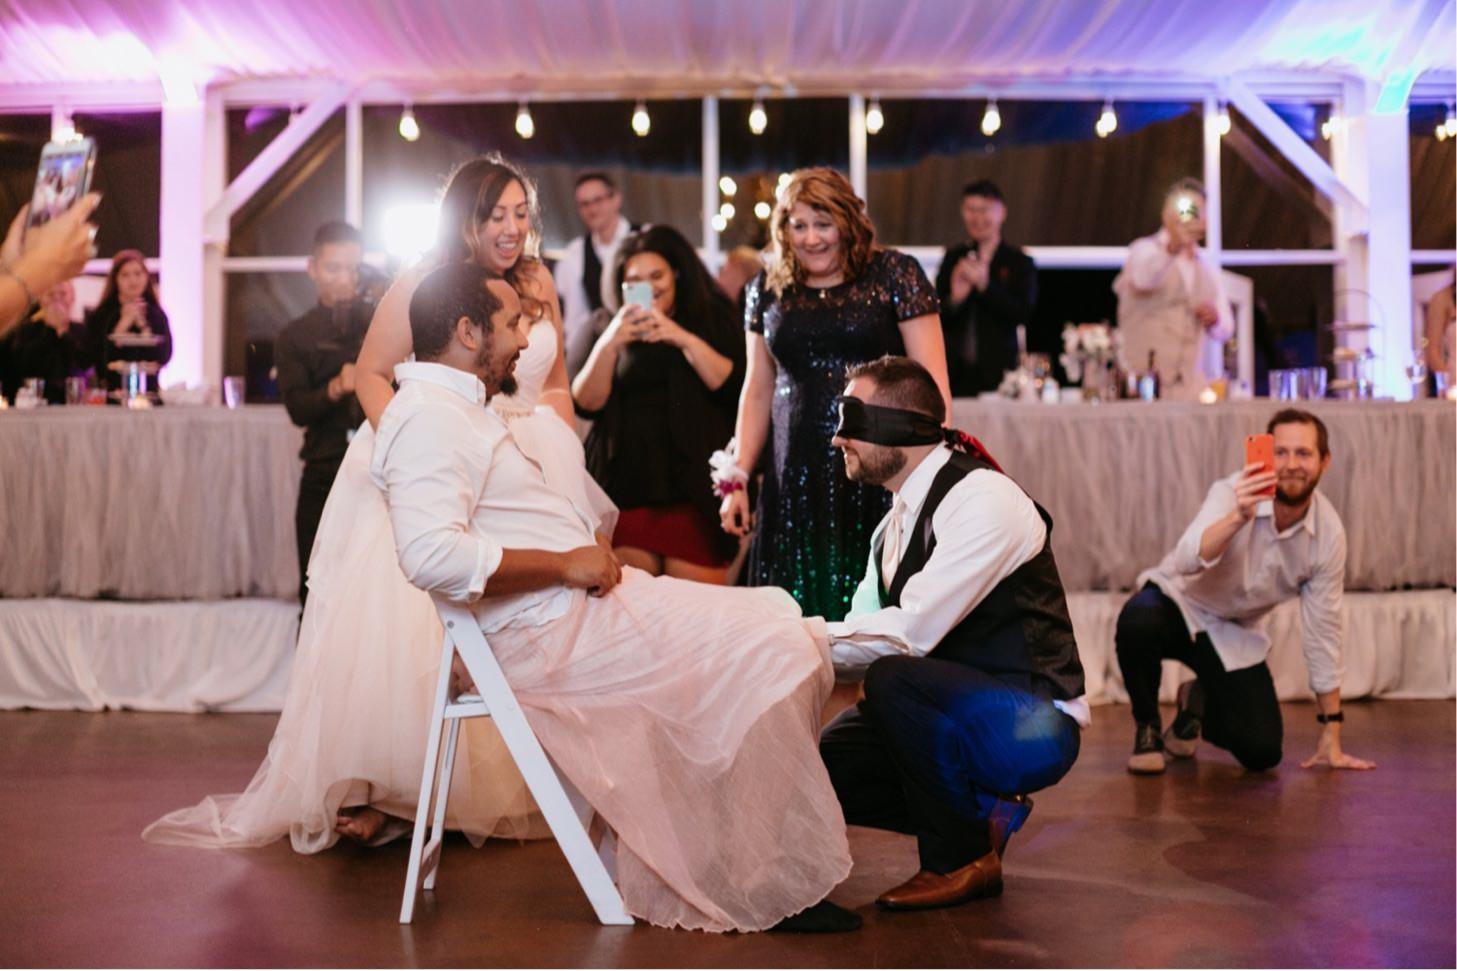 ritz-charles-wedding-reception-downtown-indianapolis-wedding-photographer075.JPG